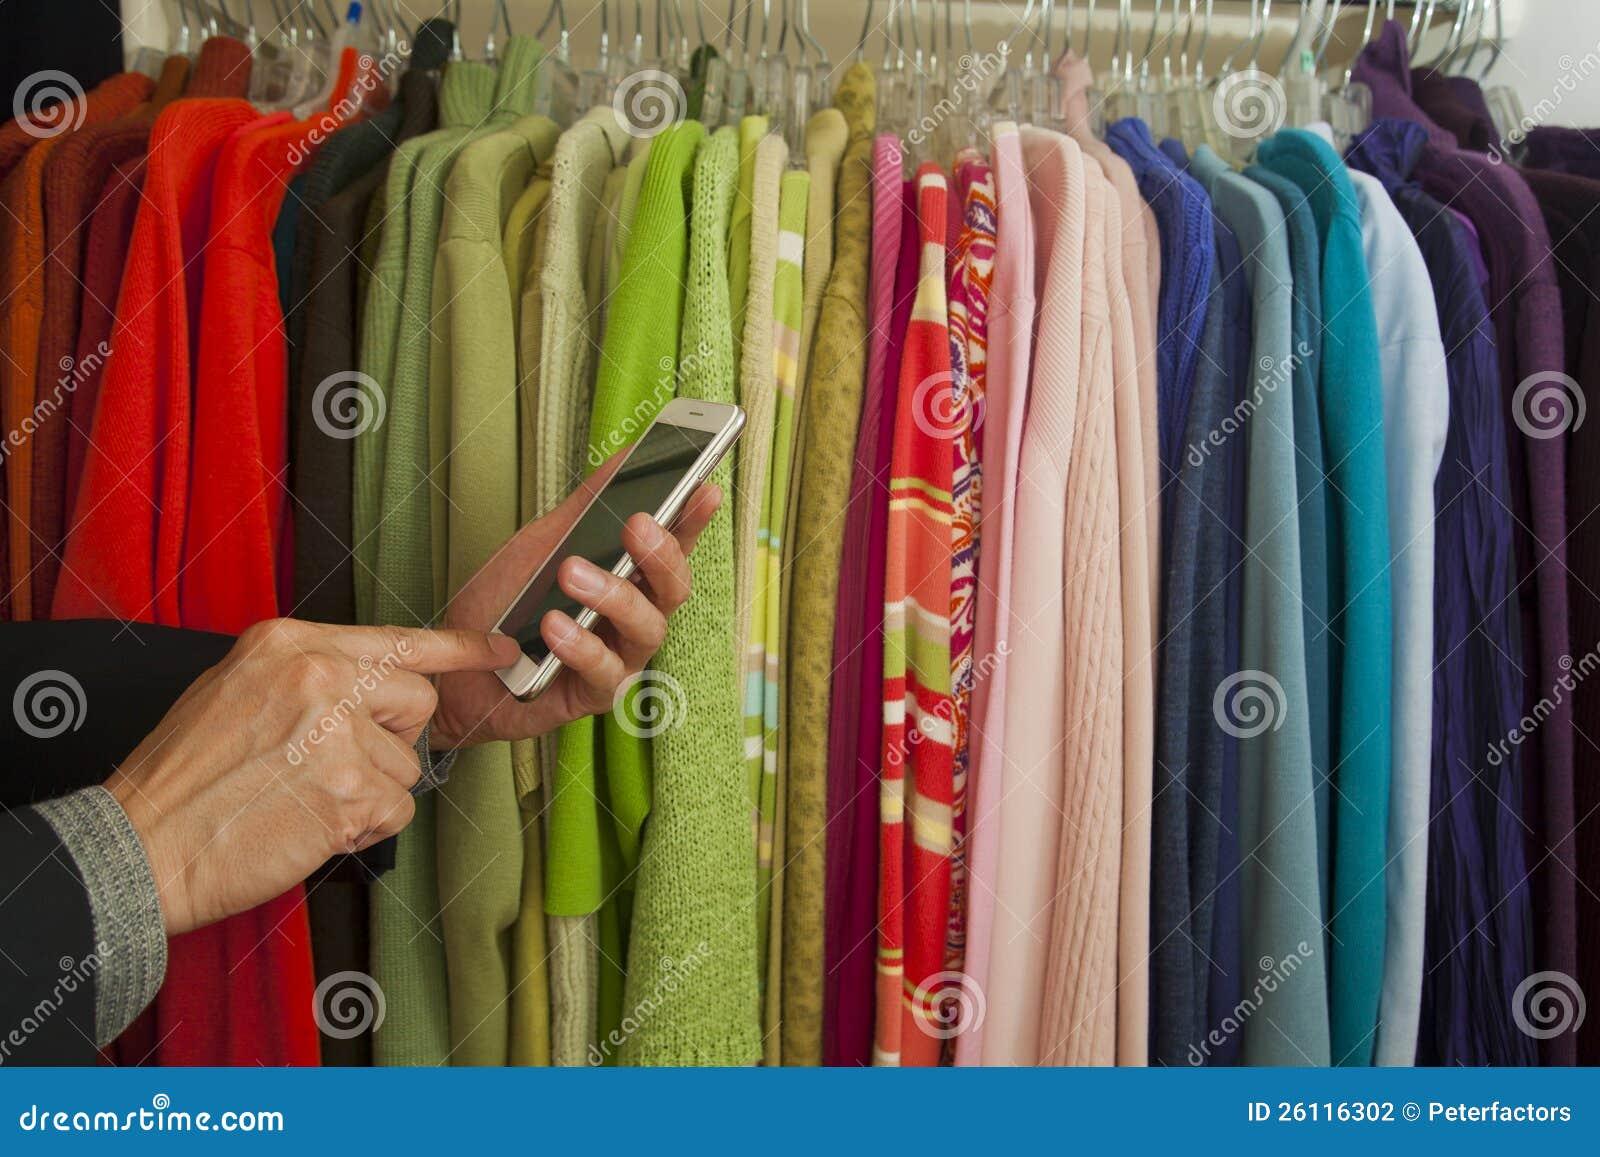 Slimme telefoon in levering aan eindgebruikers